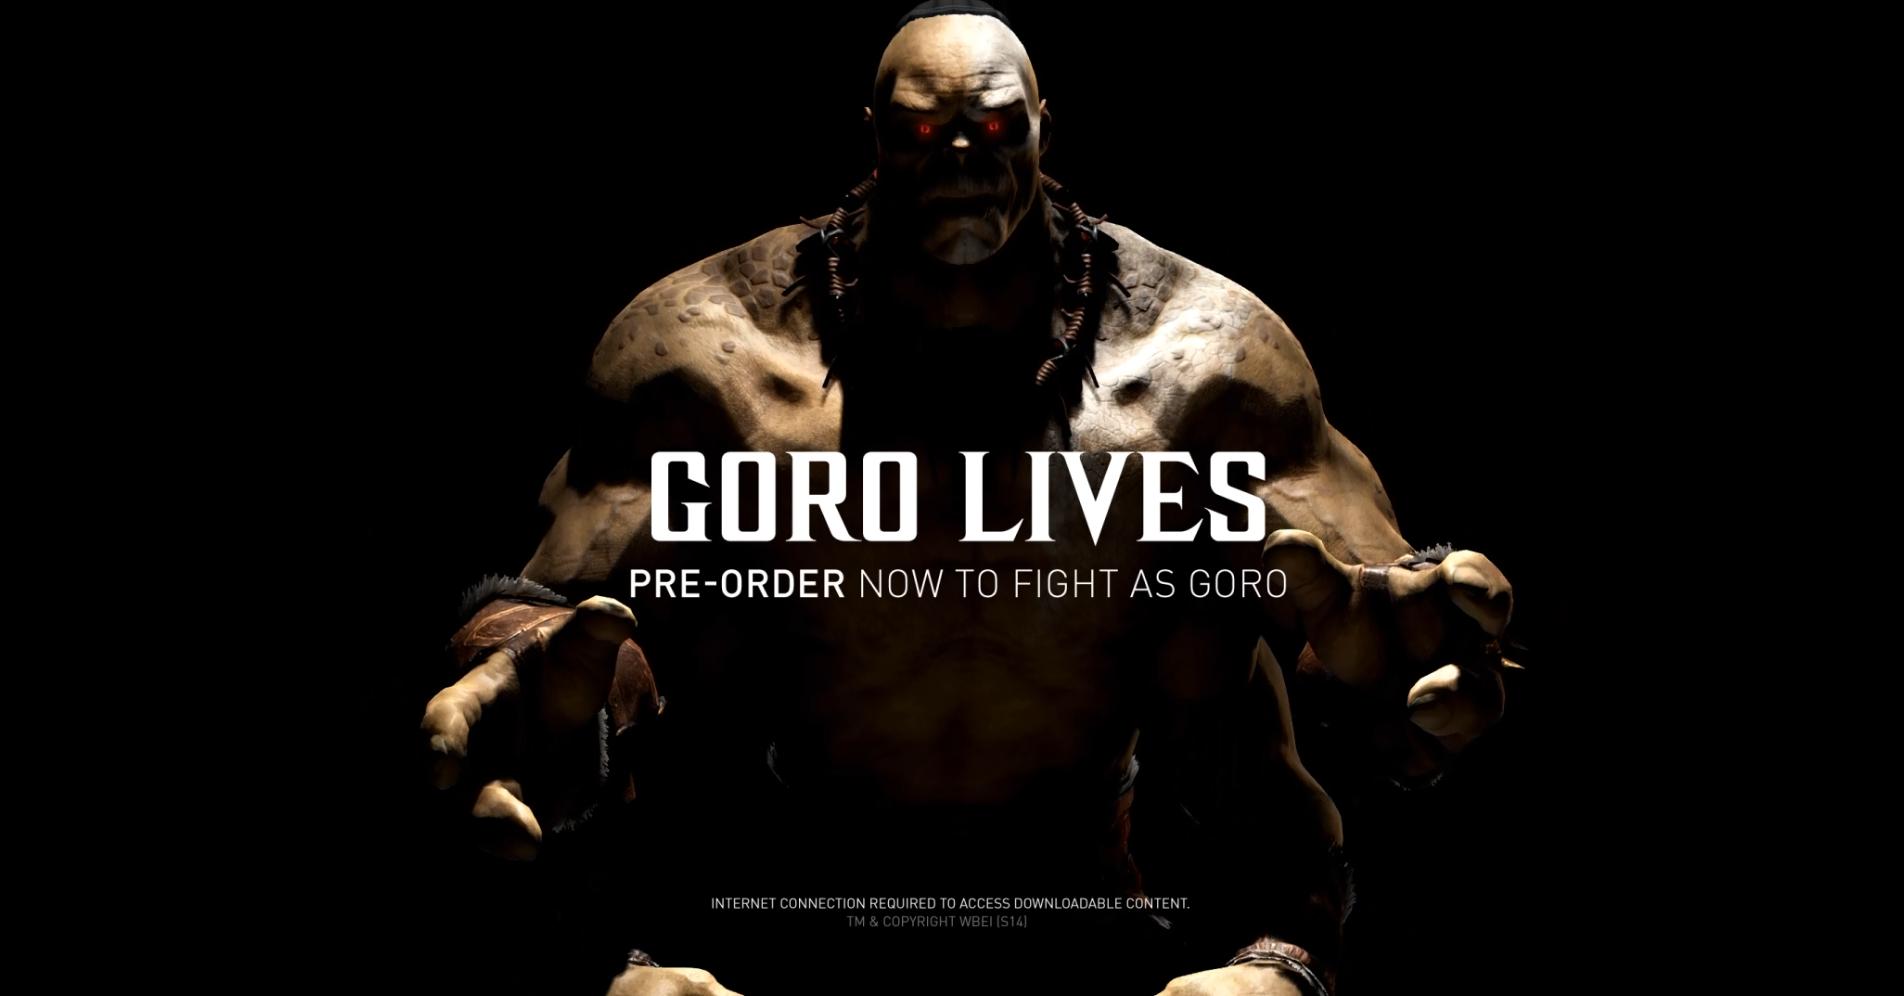 Goro Lives - All Access Mortal Kombat X Streaming Event - Mortal